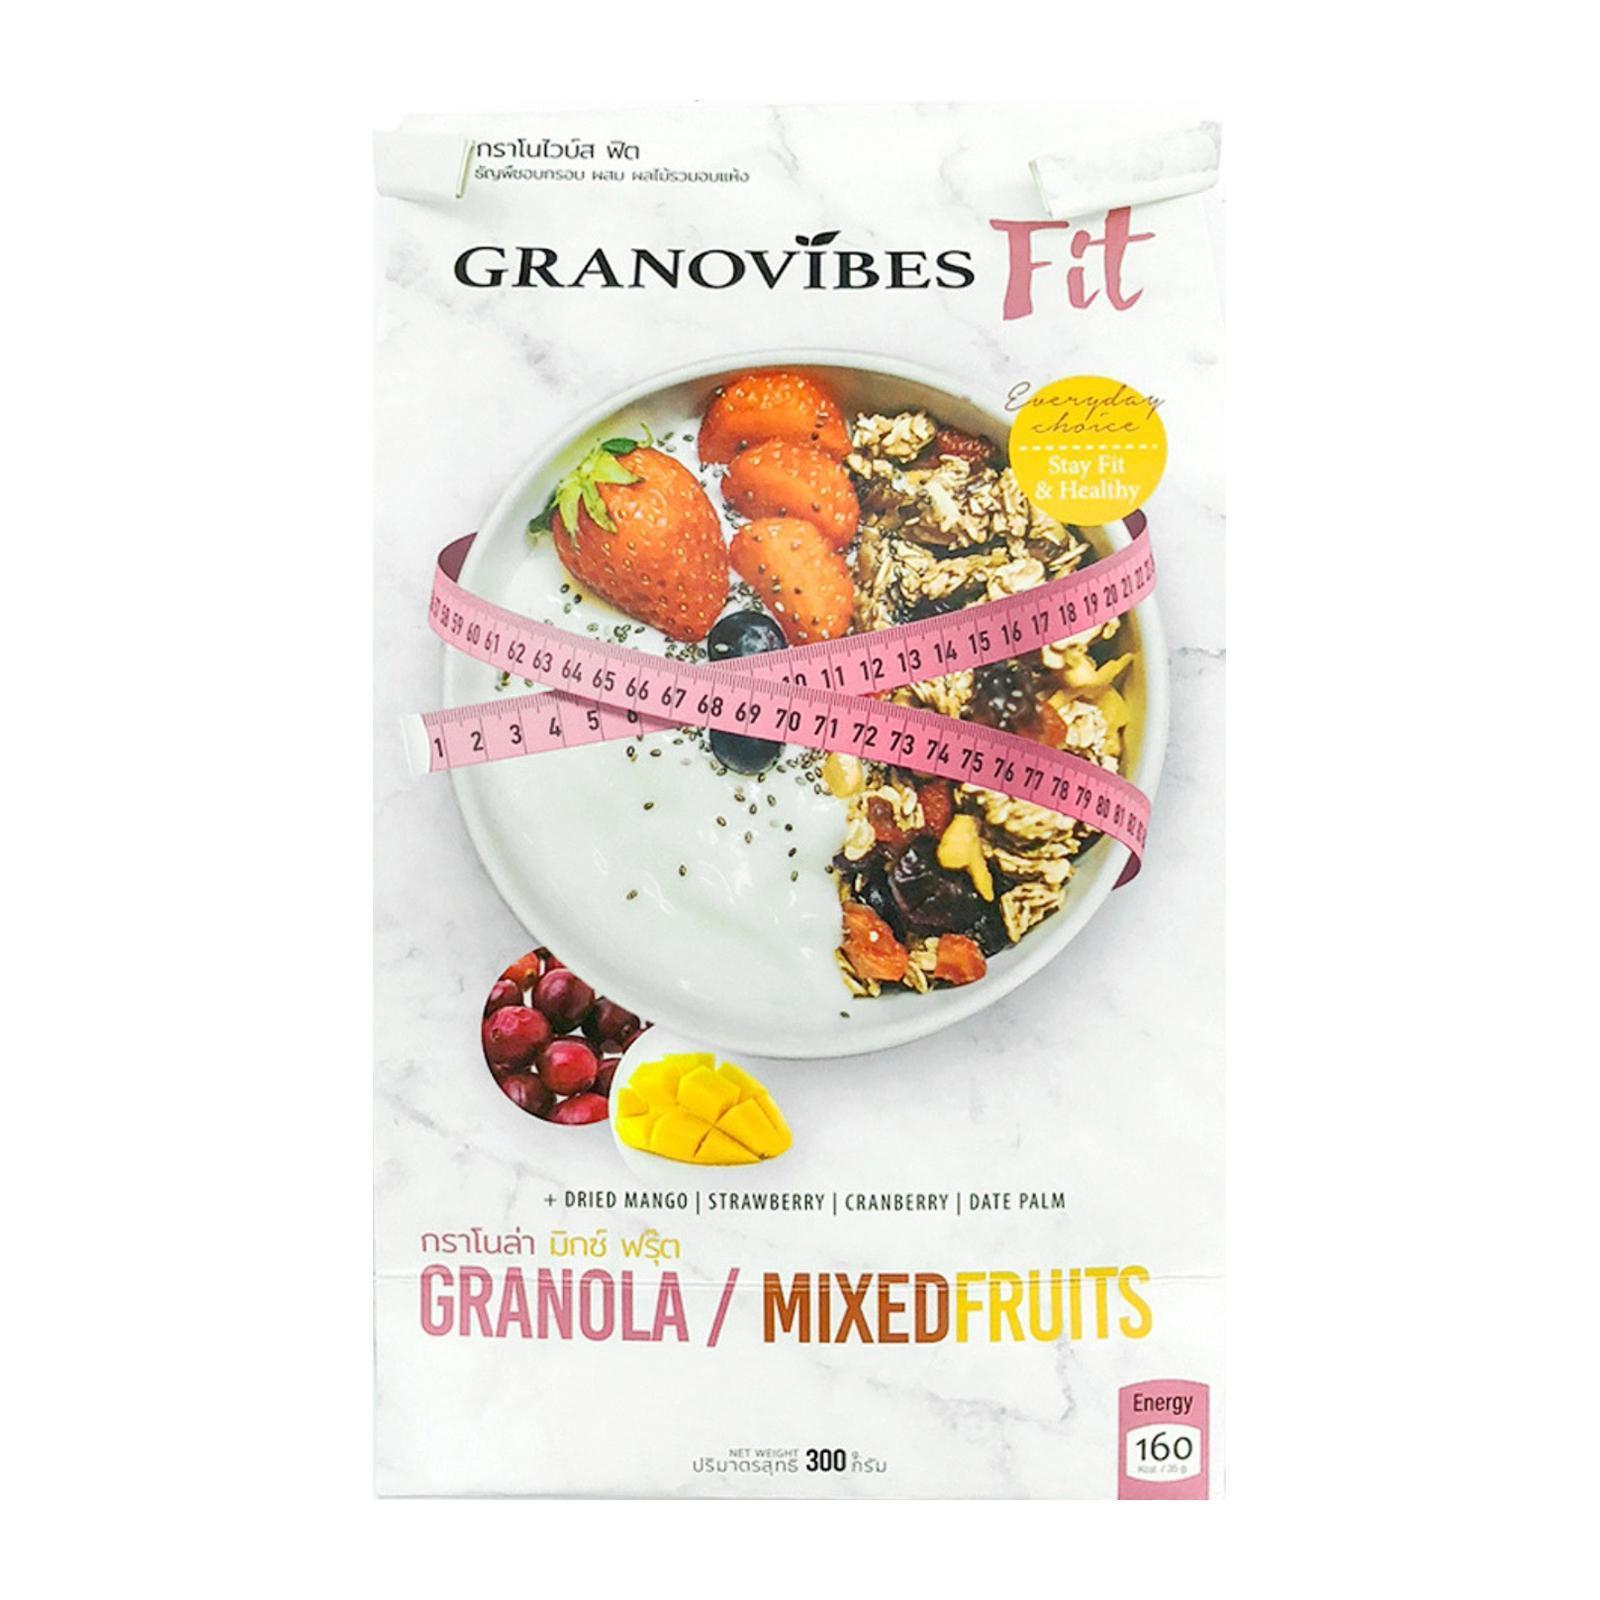 Granovibes Fit Mixed Fruits - Granola